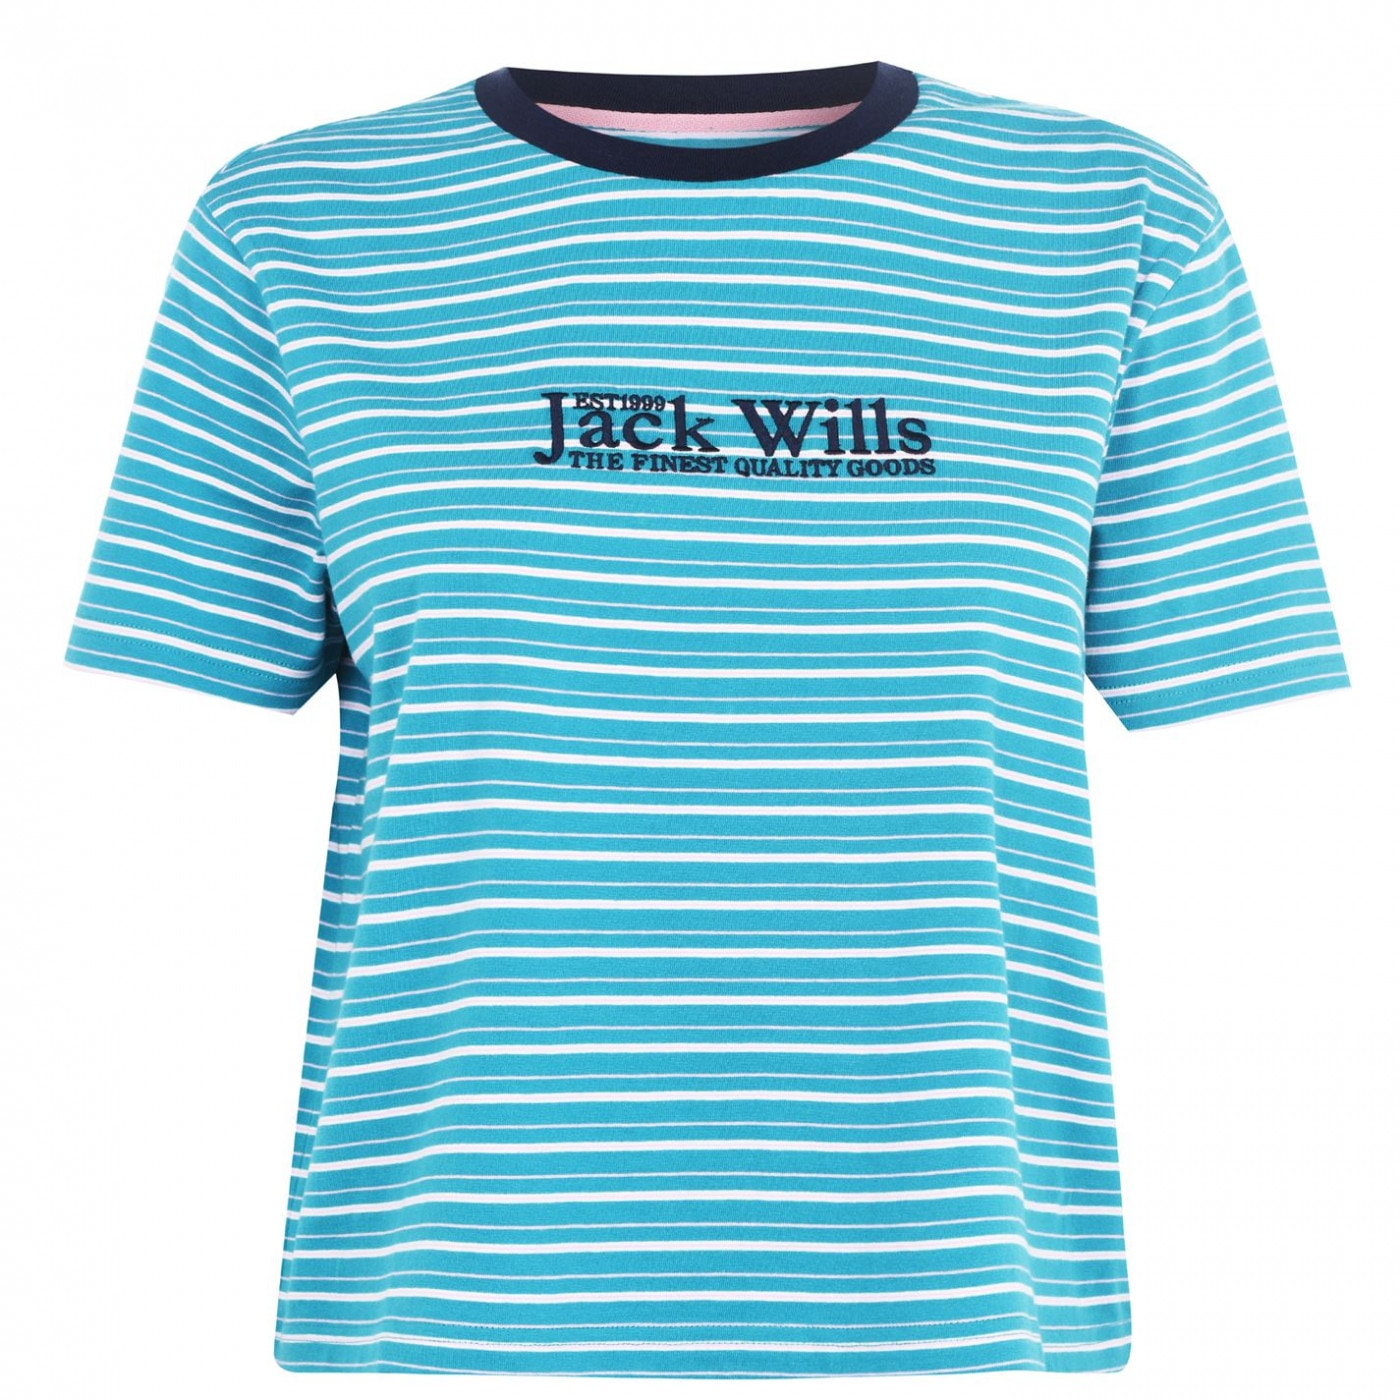 Jack Wills Milsom Boxy Tee Ld00